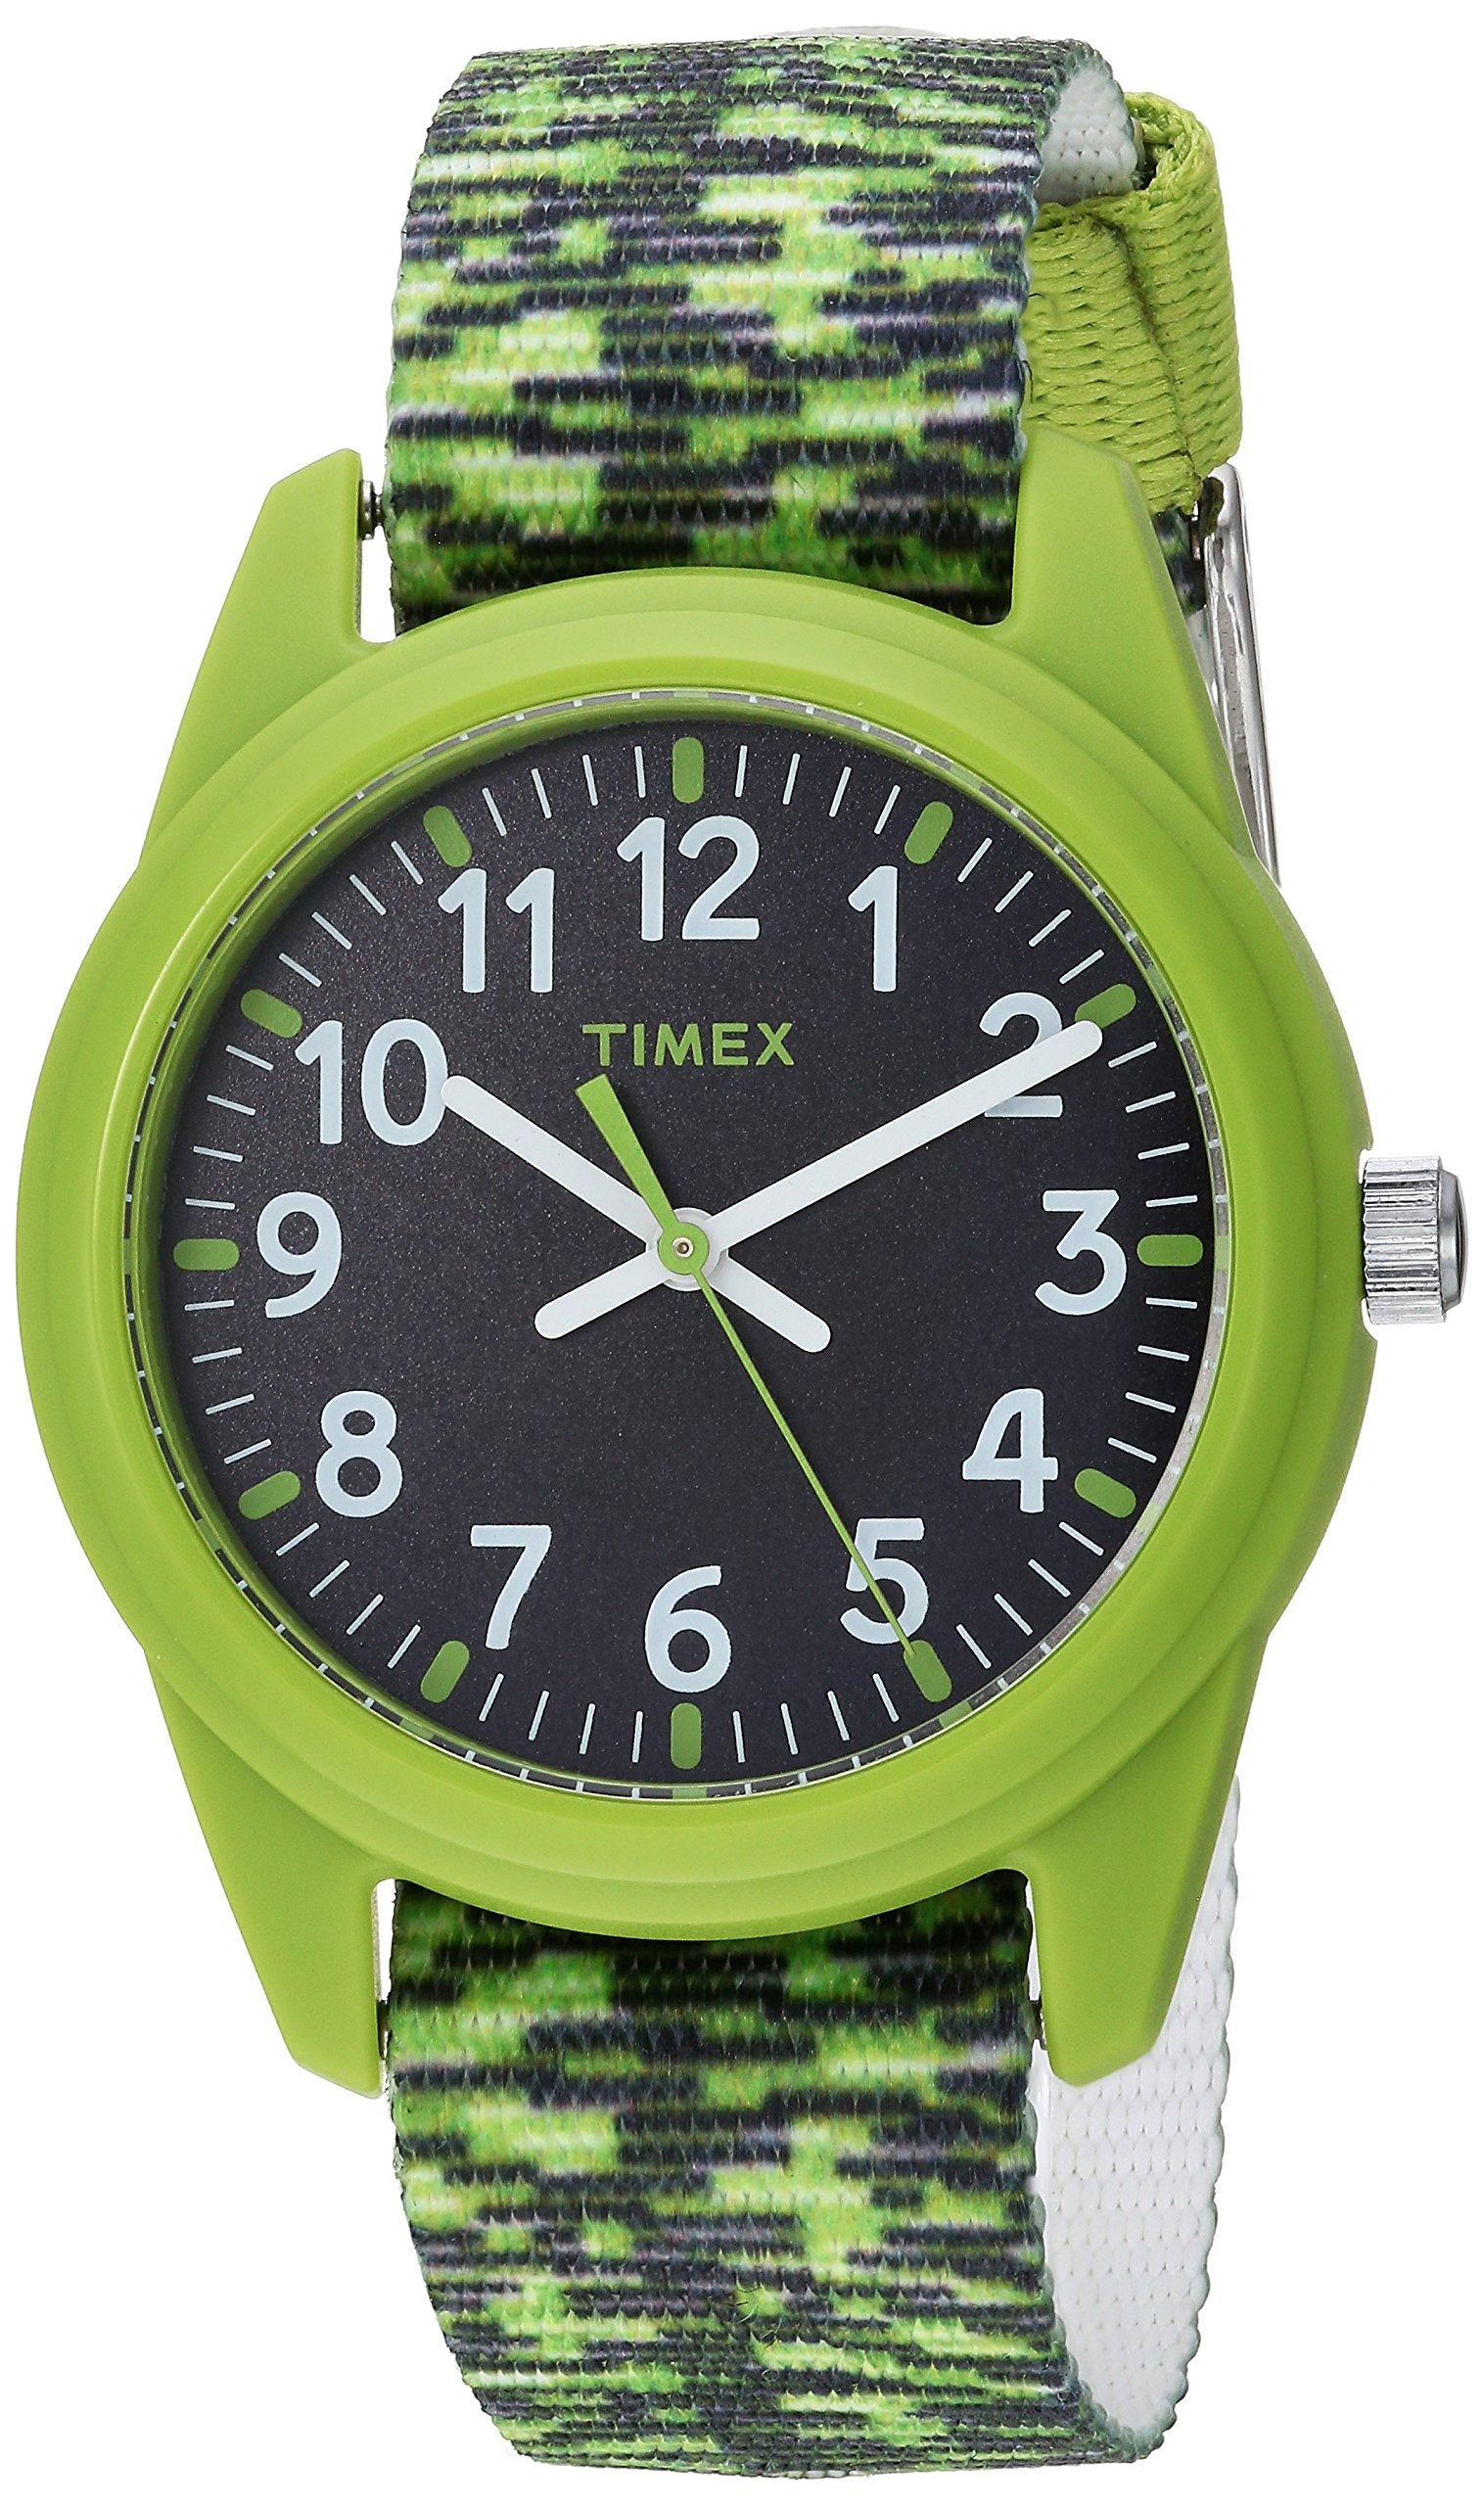 Timex Boys TW7C11900 Time Machines Green/Black Sport Elastic Fabric Strap Watch by Timex